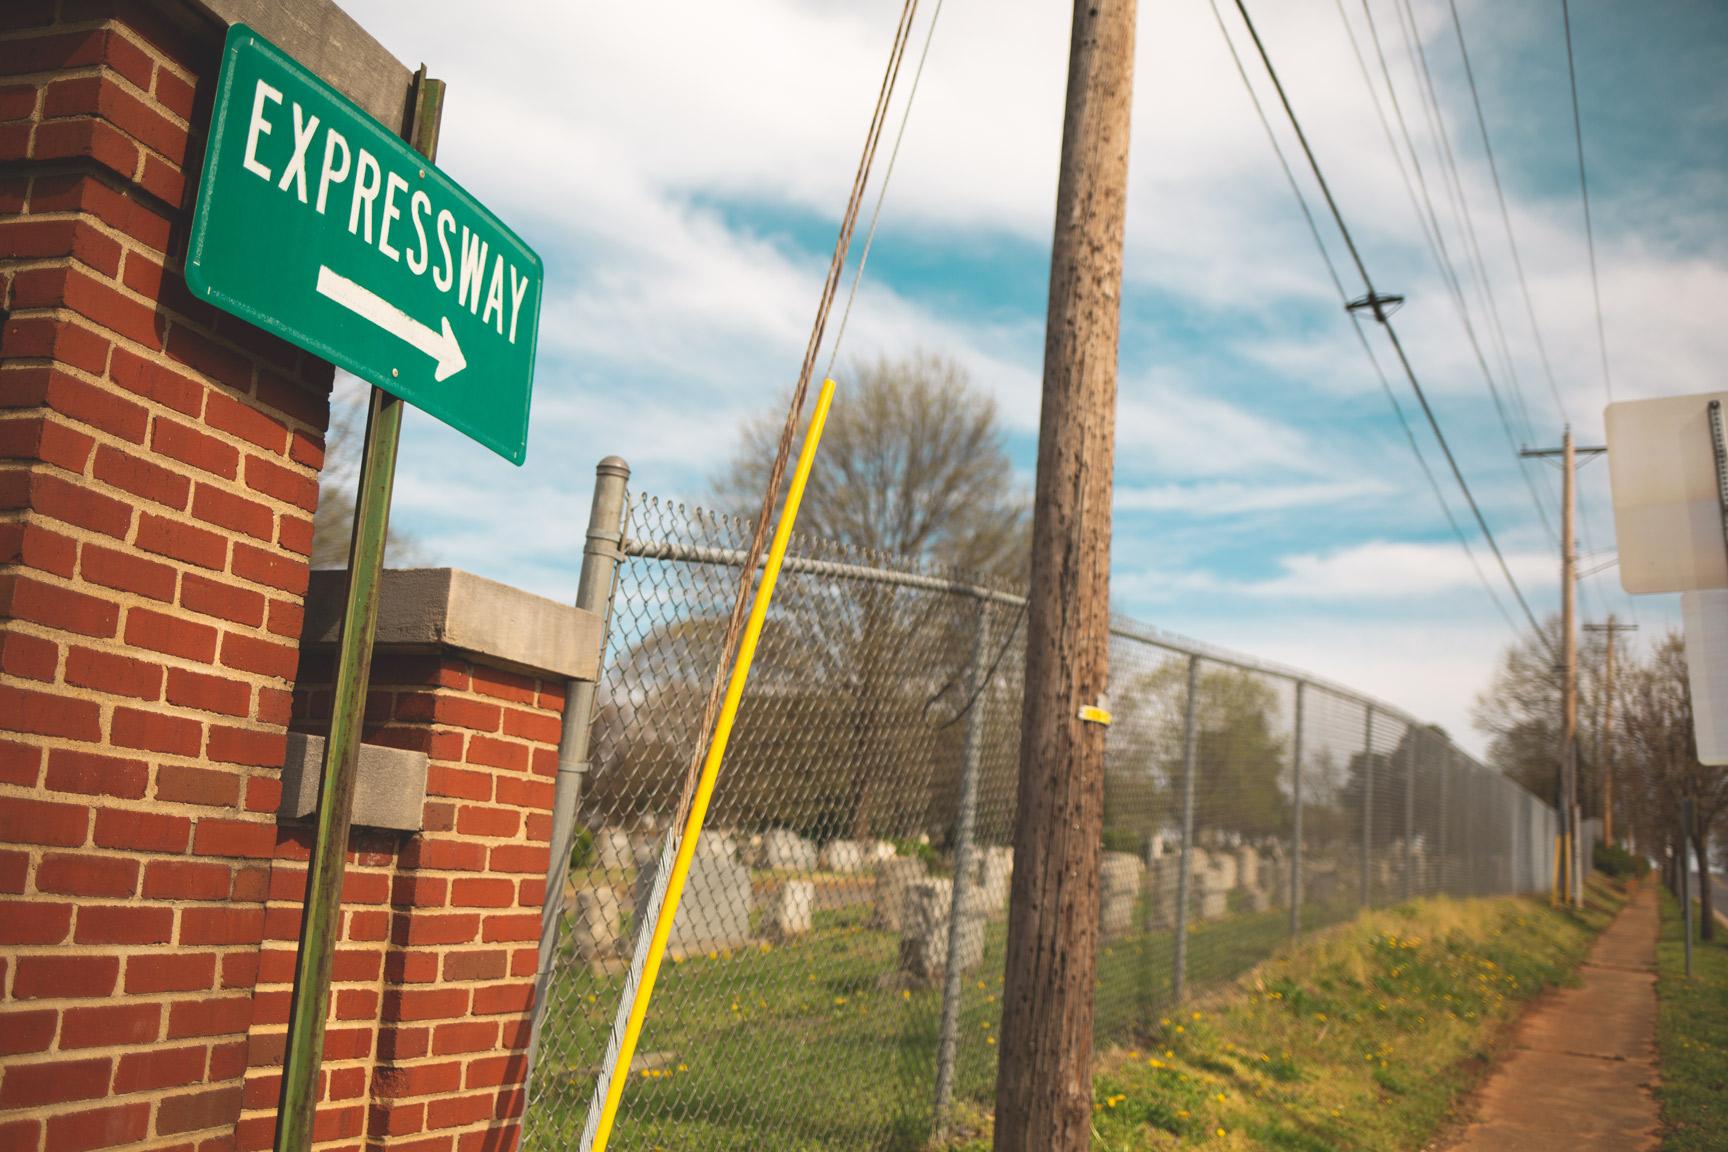 Expressway , Lynchburg, VA, 2019